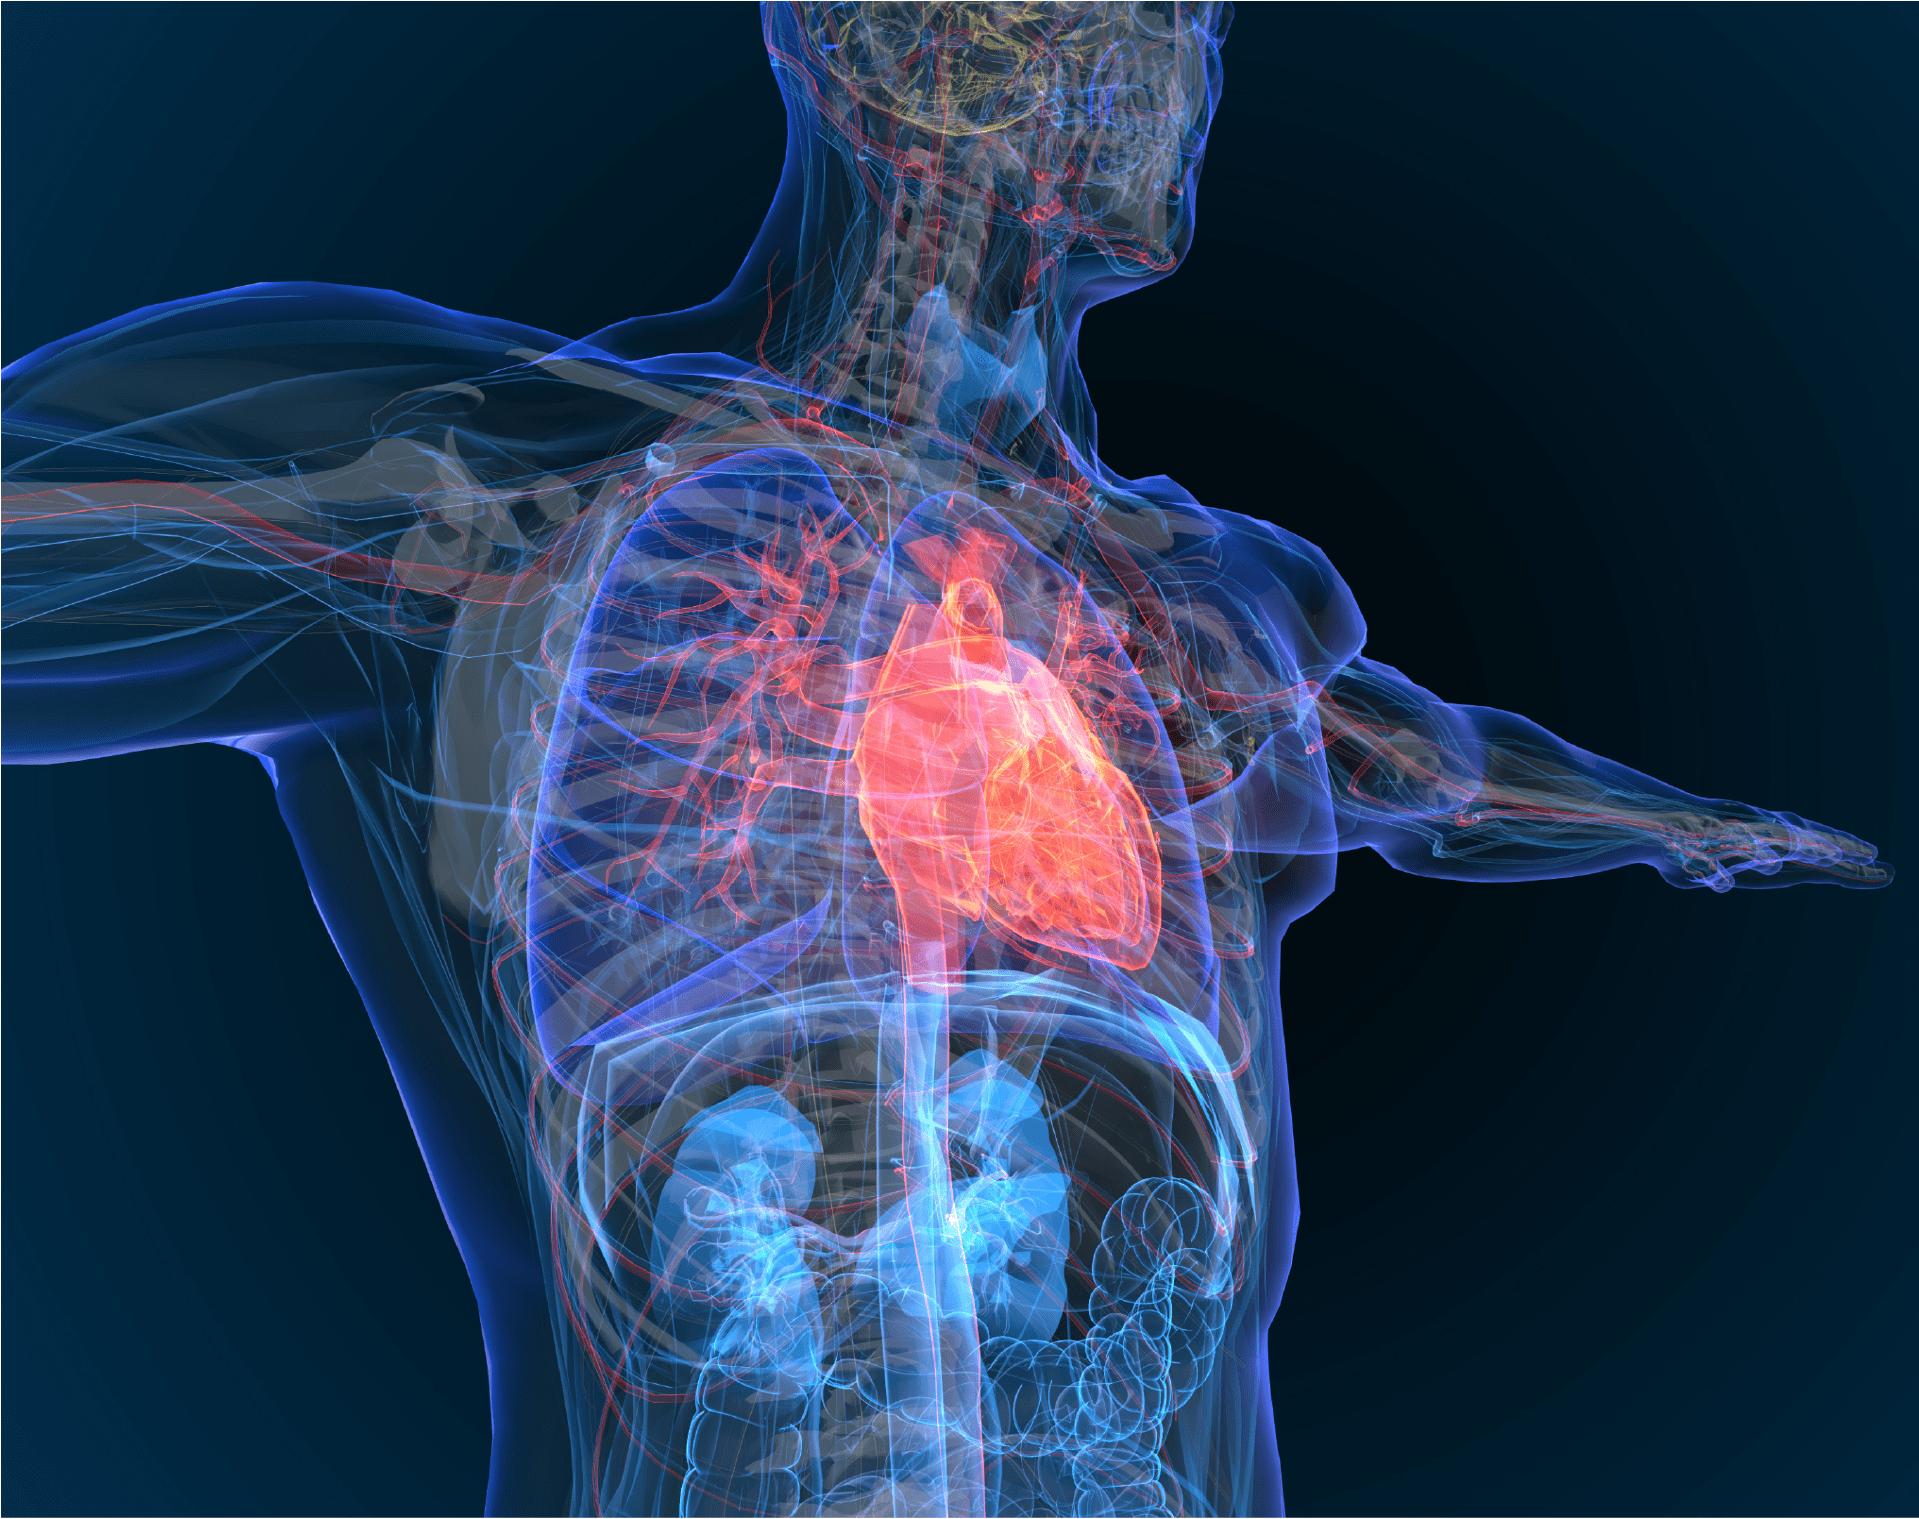 Health Management Insight: Coronary heart disease